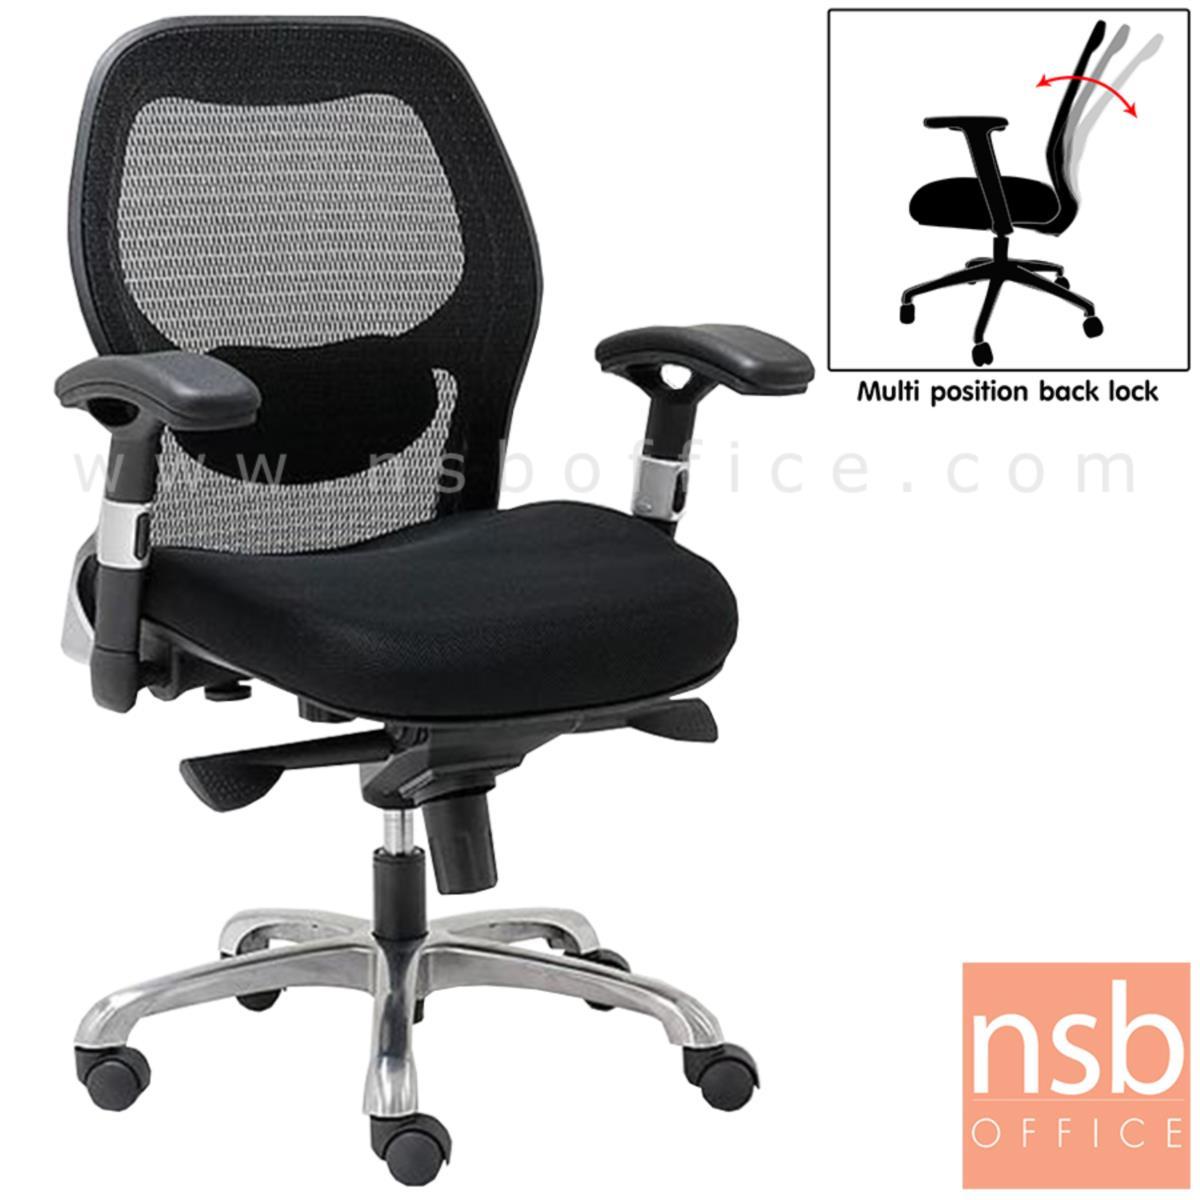 B24A034:เก้าอี้ผู้บริหารหลังเน็ต รุ่น Ehrlich (แอร์ลิช)  โช๊คแก๊ส มีก้อนโยก ขาอลูมิเนียม